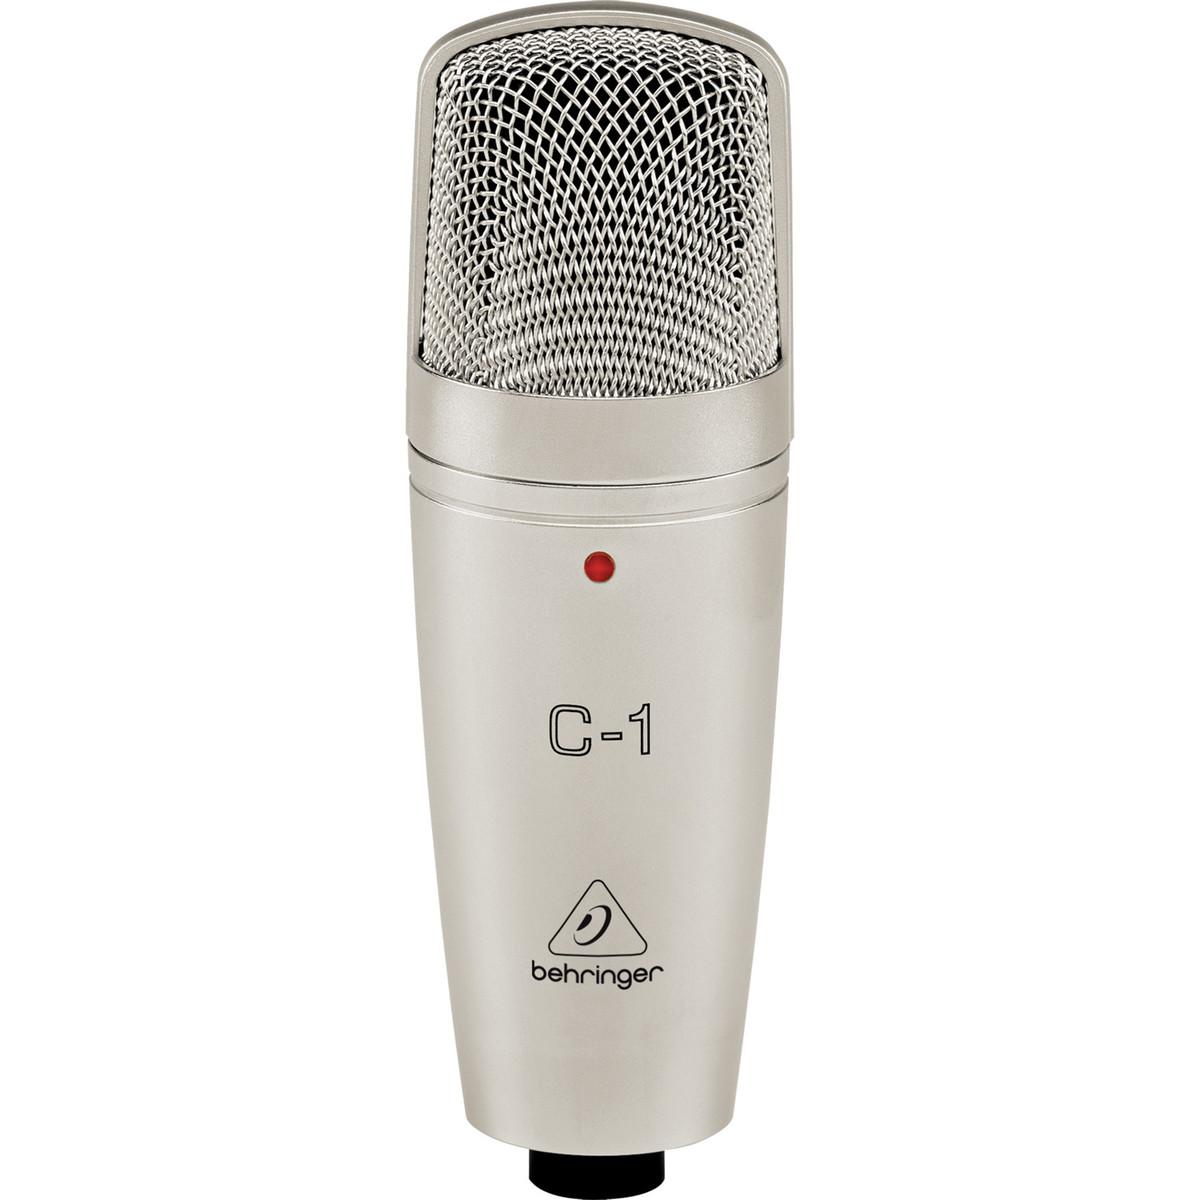 Image of Behringer C-1 Condenser Microphone